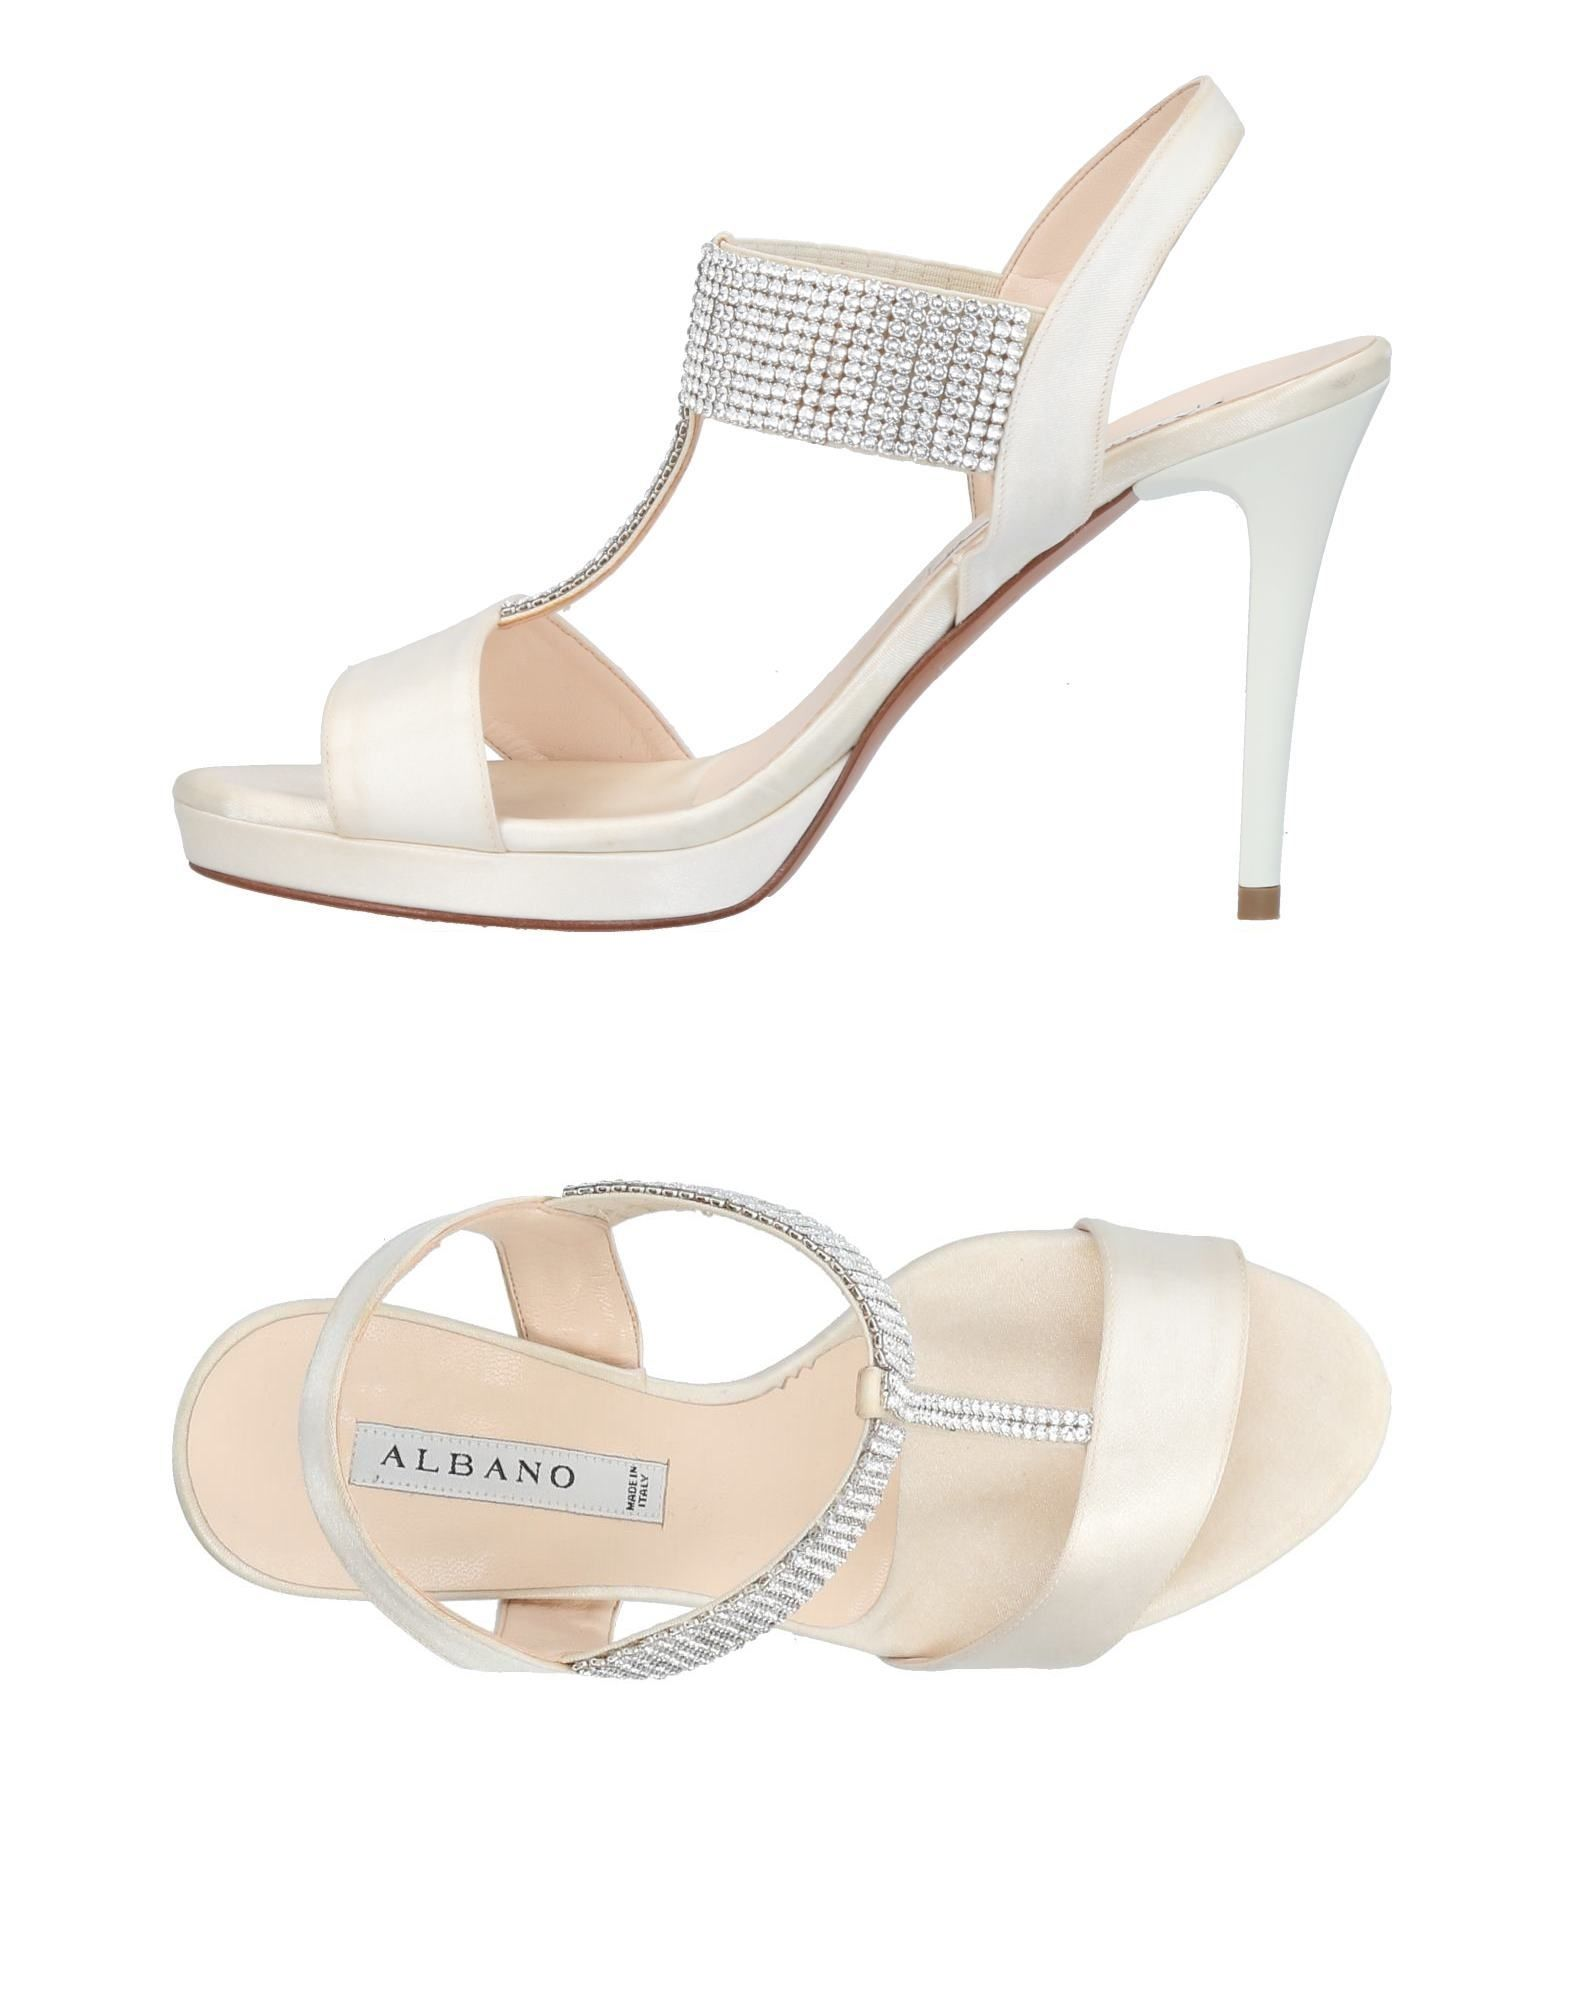 Moda Sandali Albano Donna Donna Albano - 11442273PI 1c4dc5